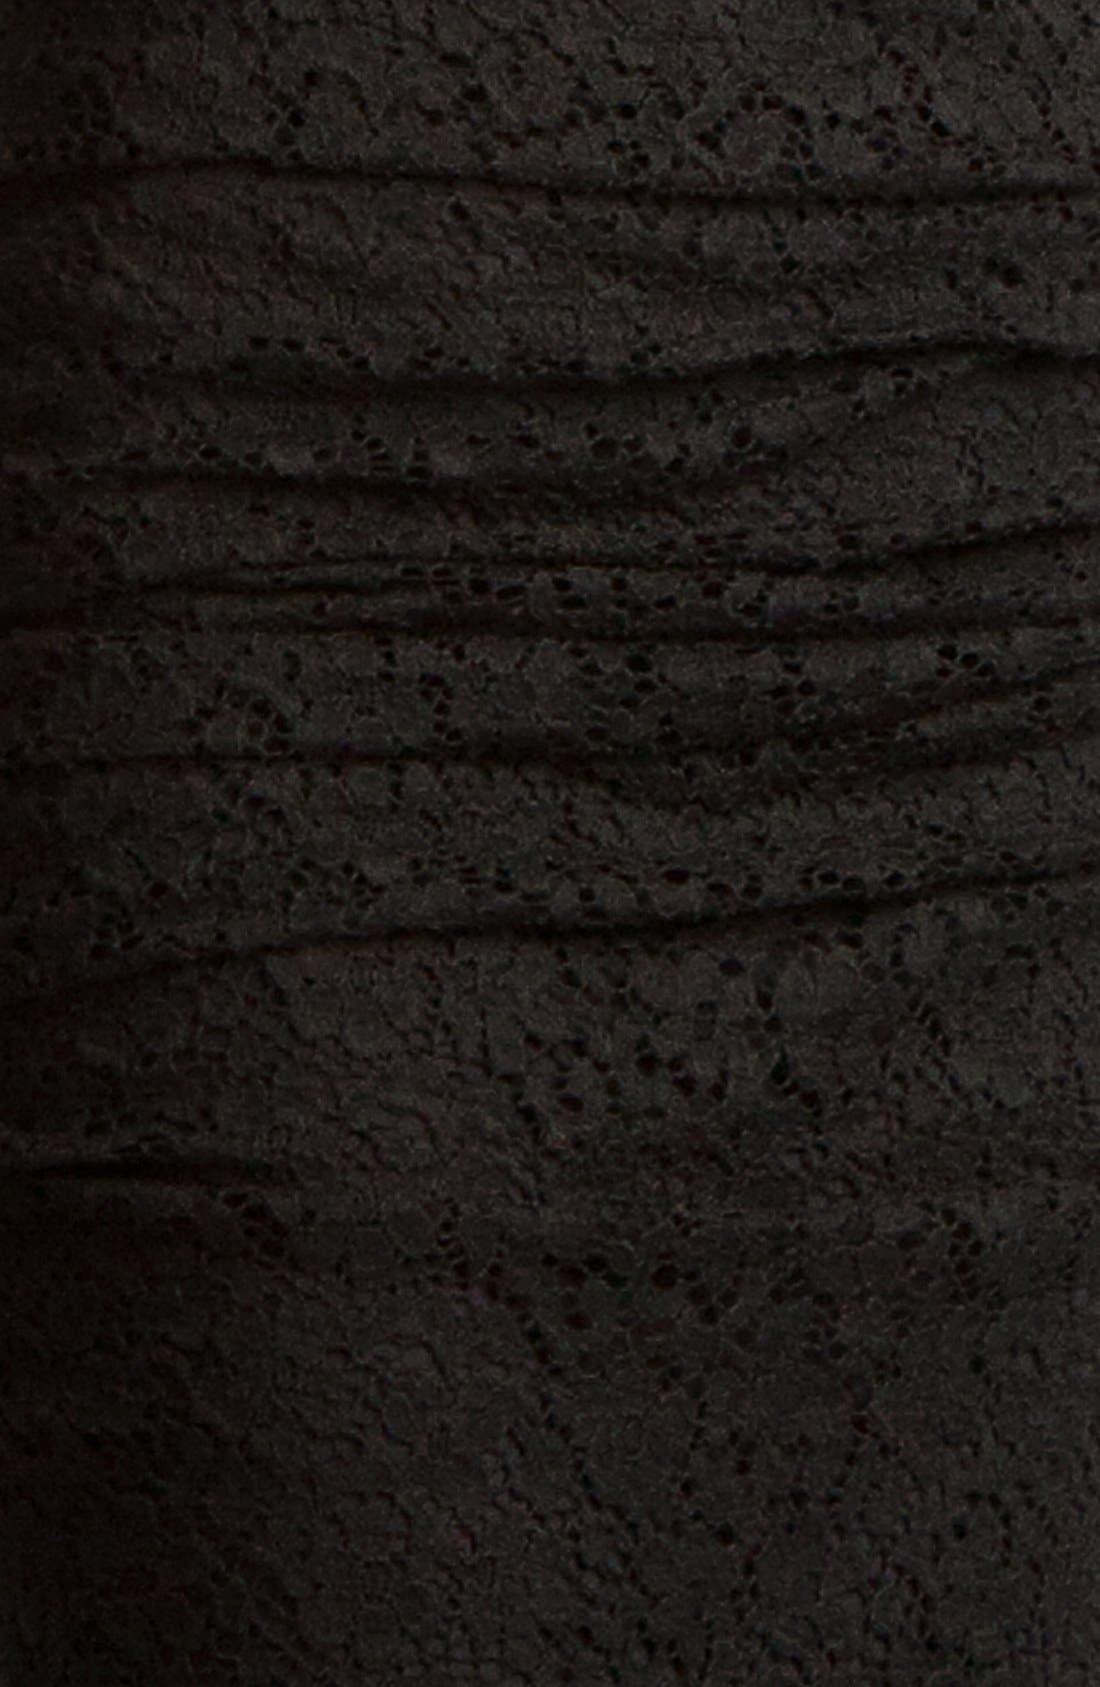 Alternate Image 3  - Dolce&Gabbana Ruched Stretch Lace Dress